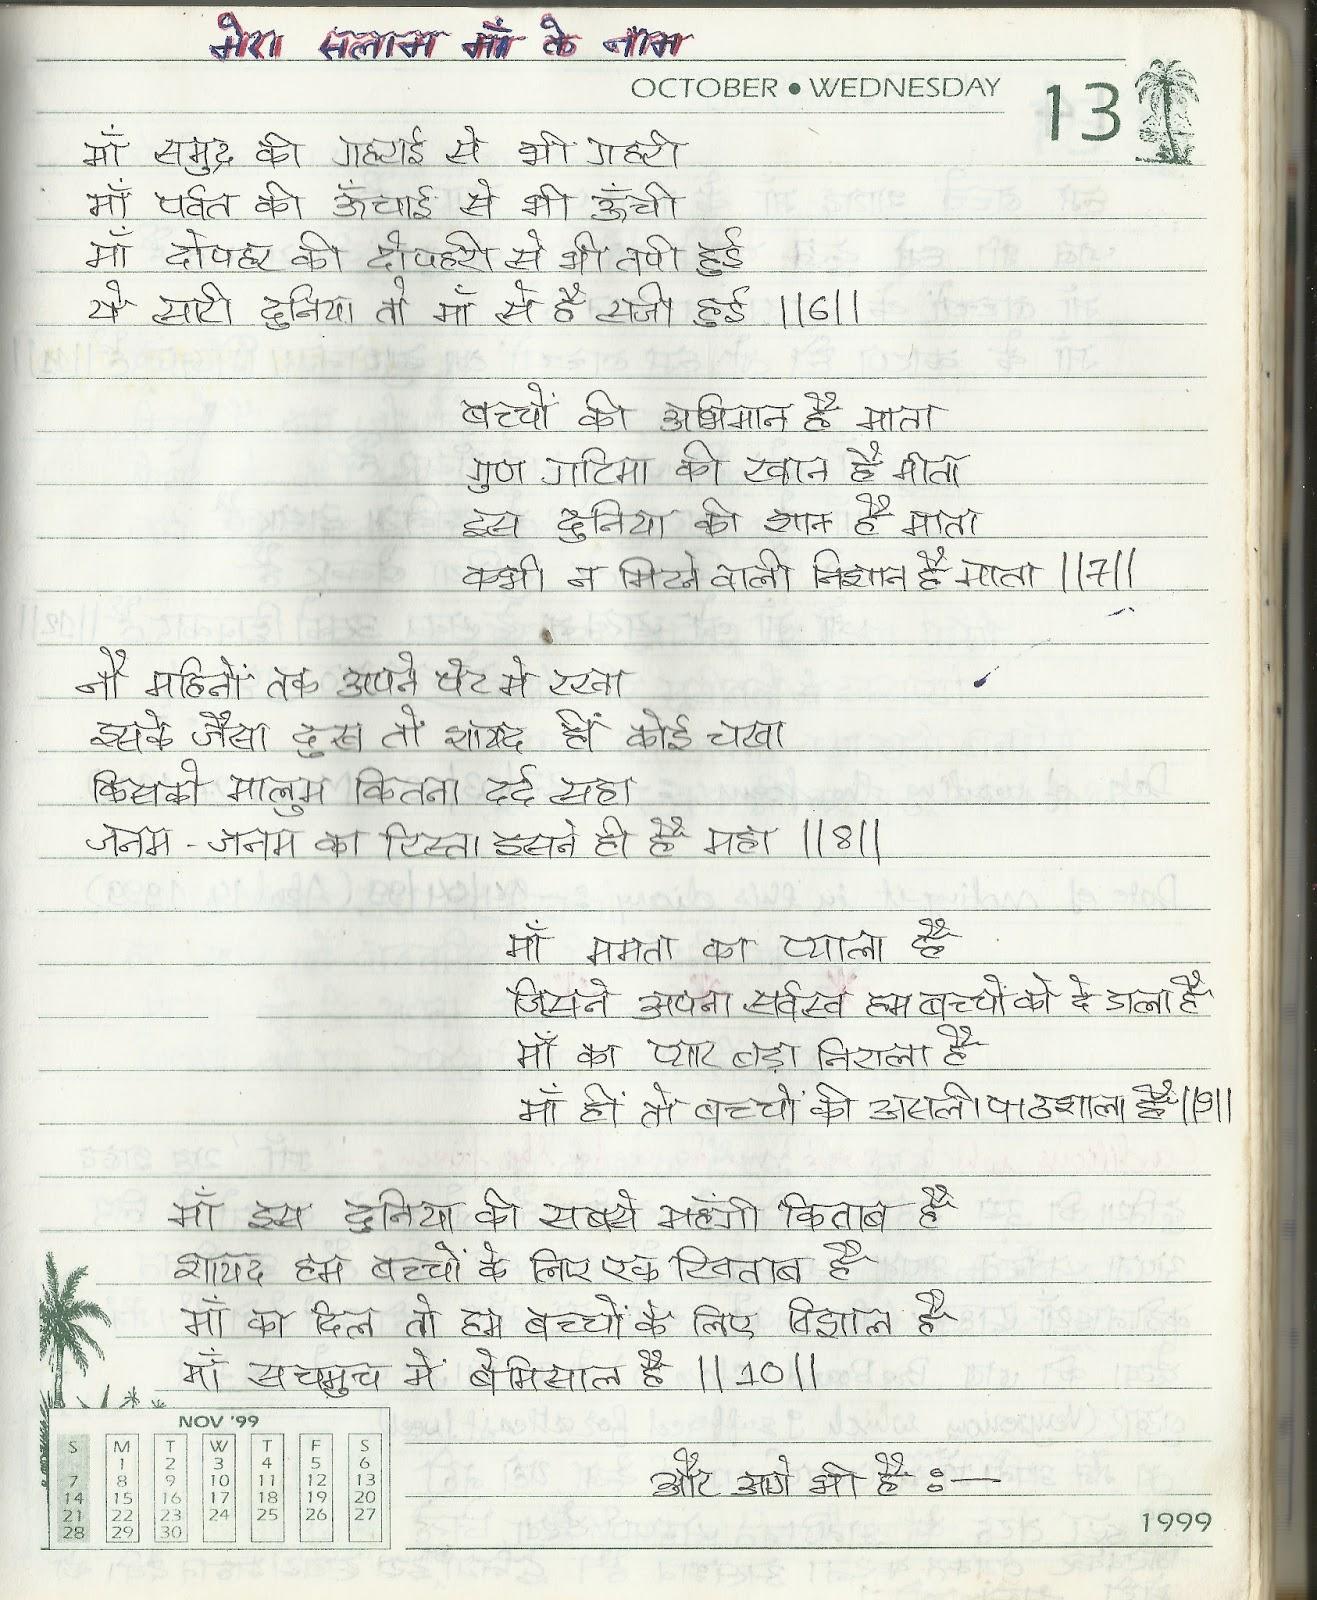 Poem for mom and dad from daughter in marathi poemsrom birthday sms in marathi language altavistaventures Images